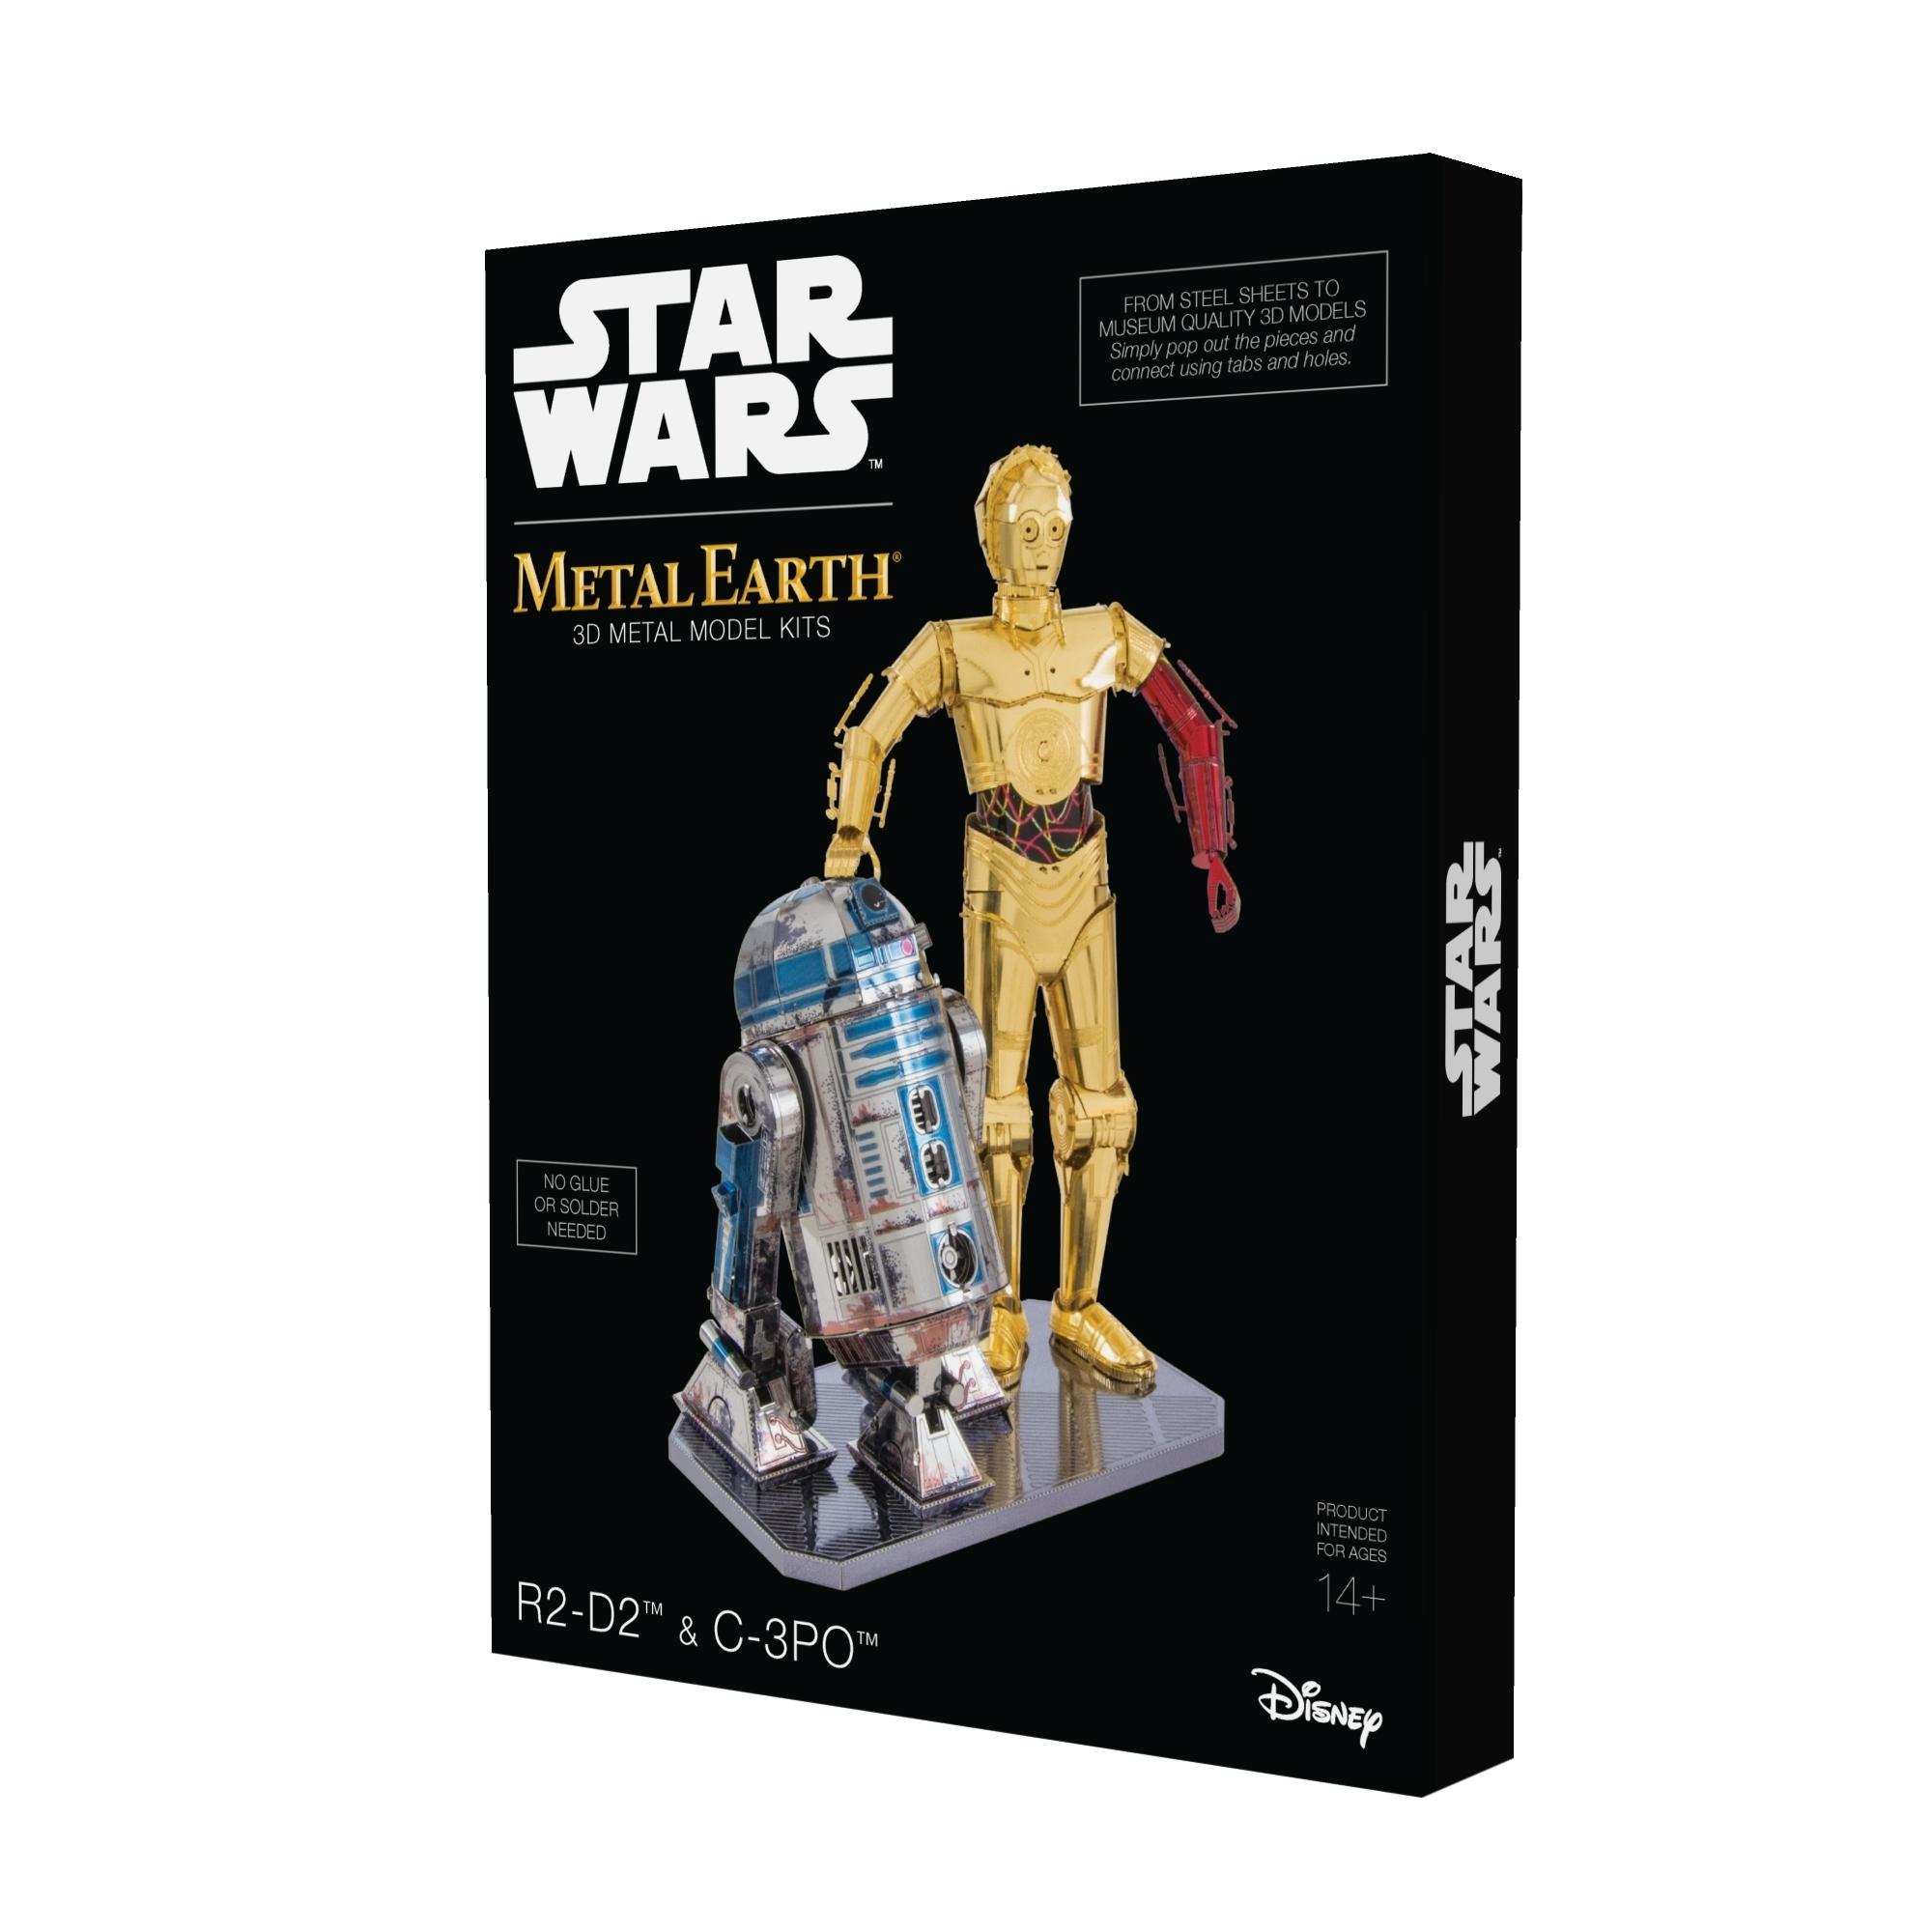 STAR WARS C-3PO & R2-D2 DELUXE SET